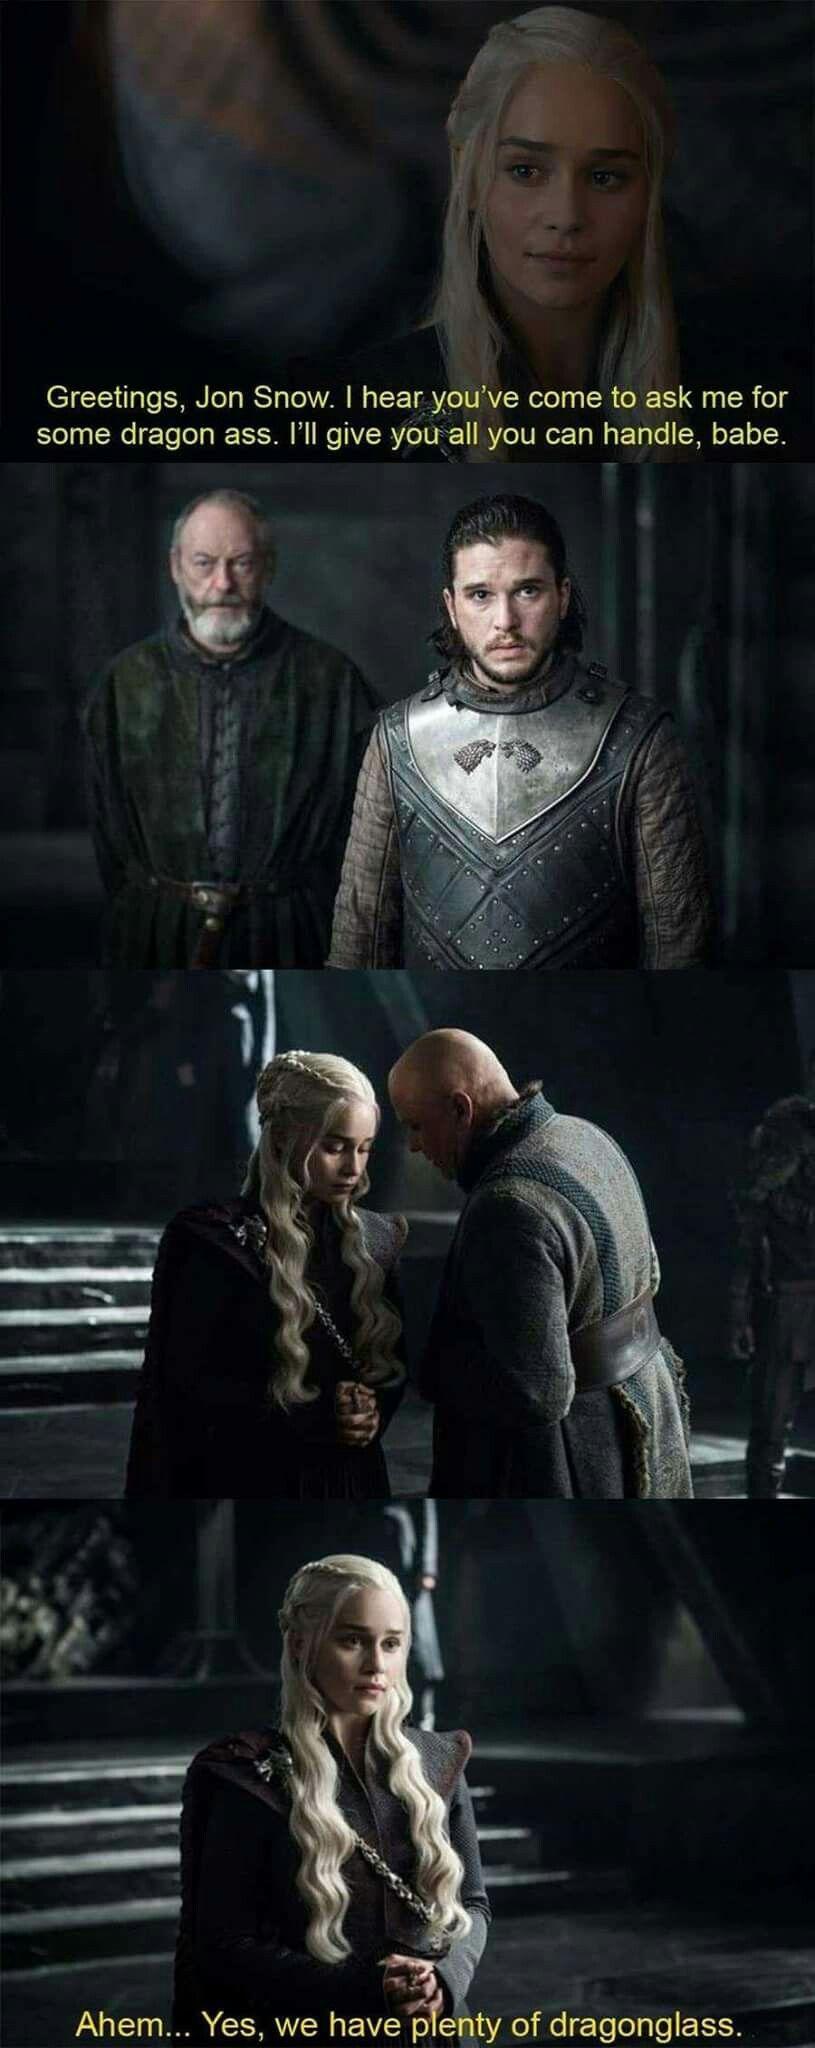 Game of thrones funny humour meme, season 7. Jon Snow